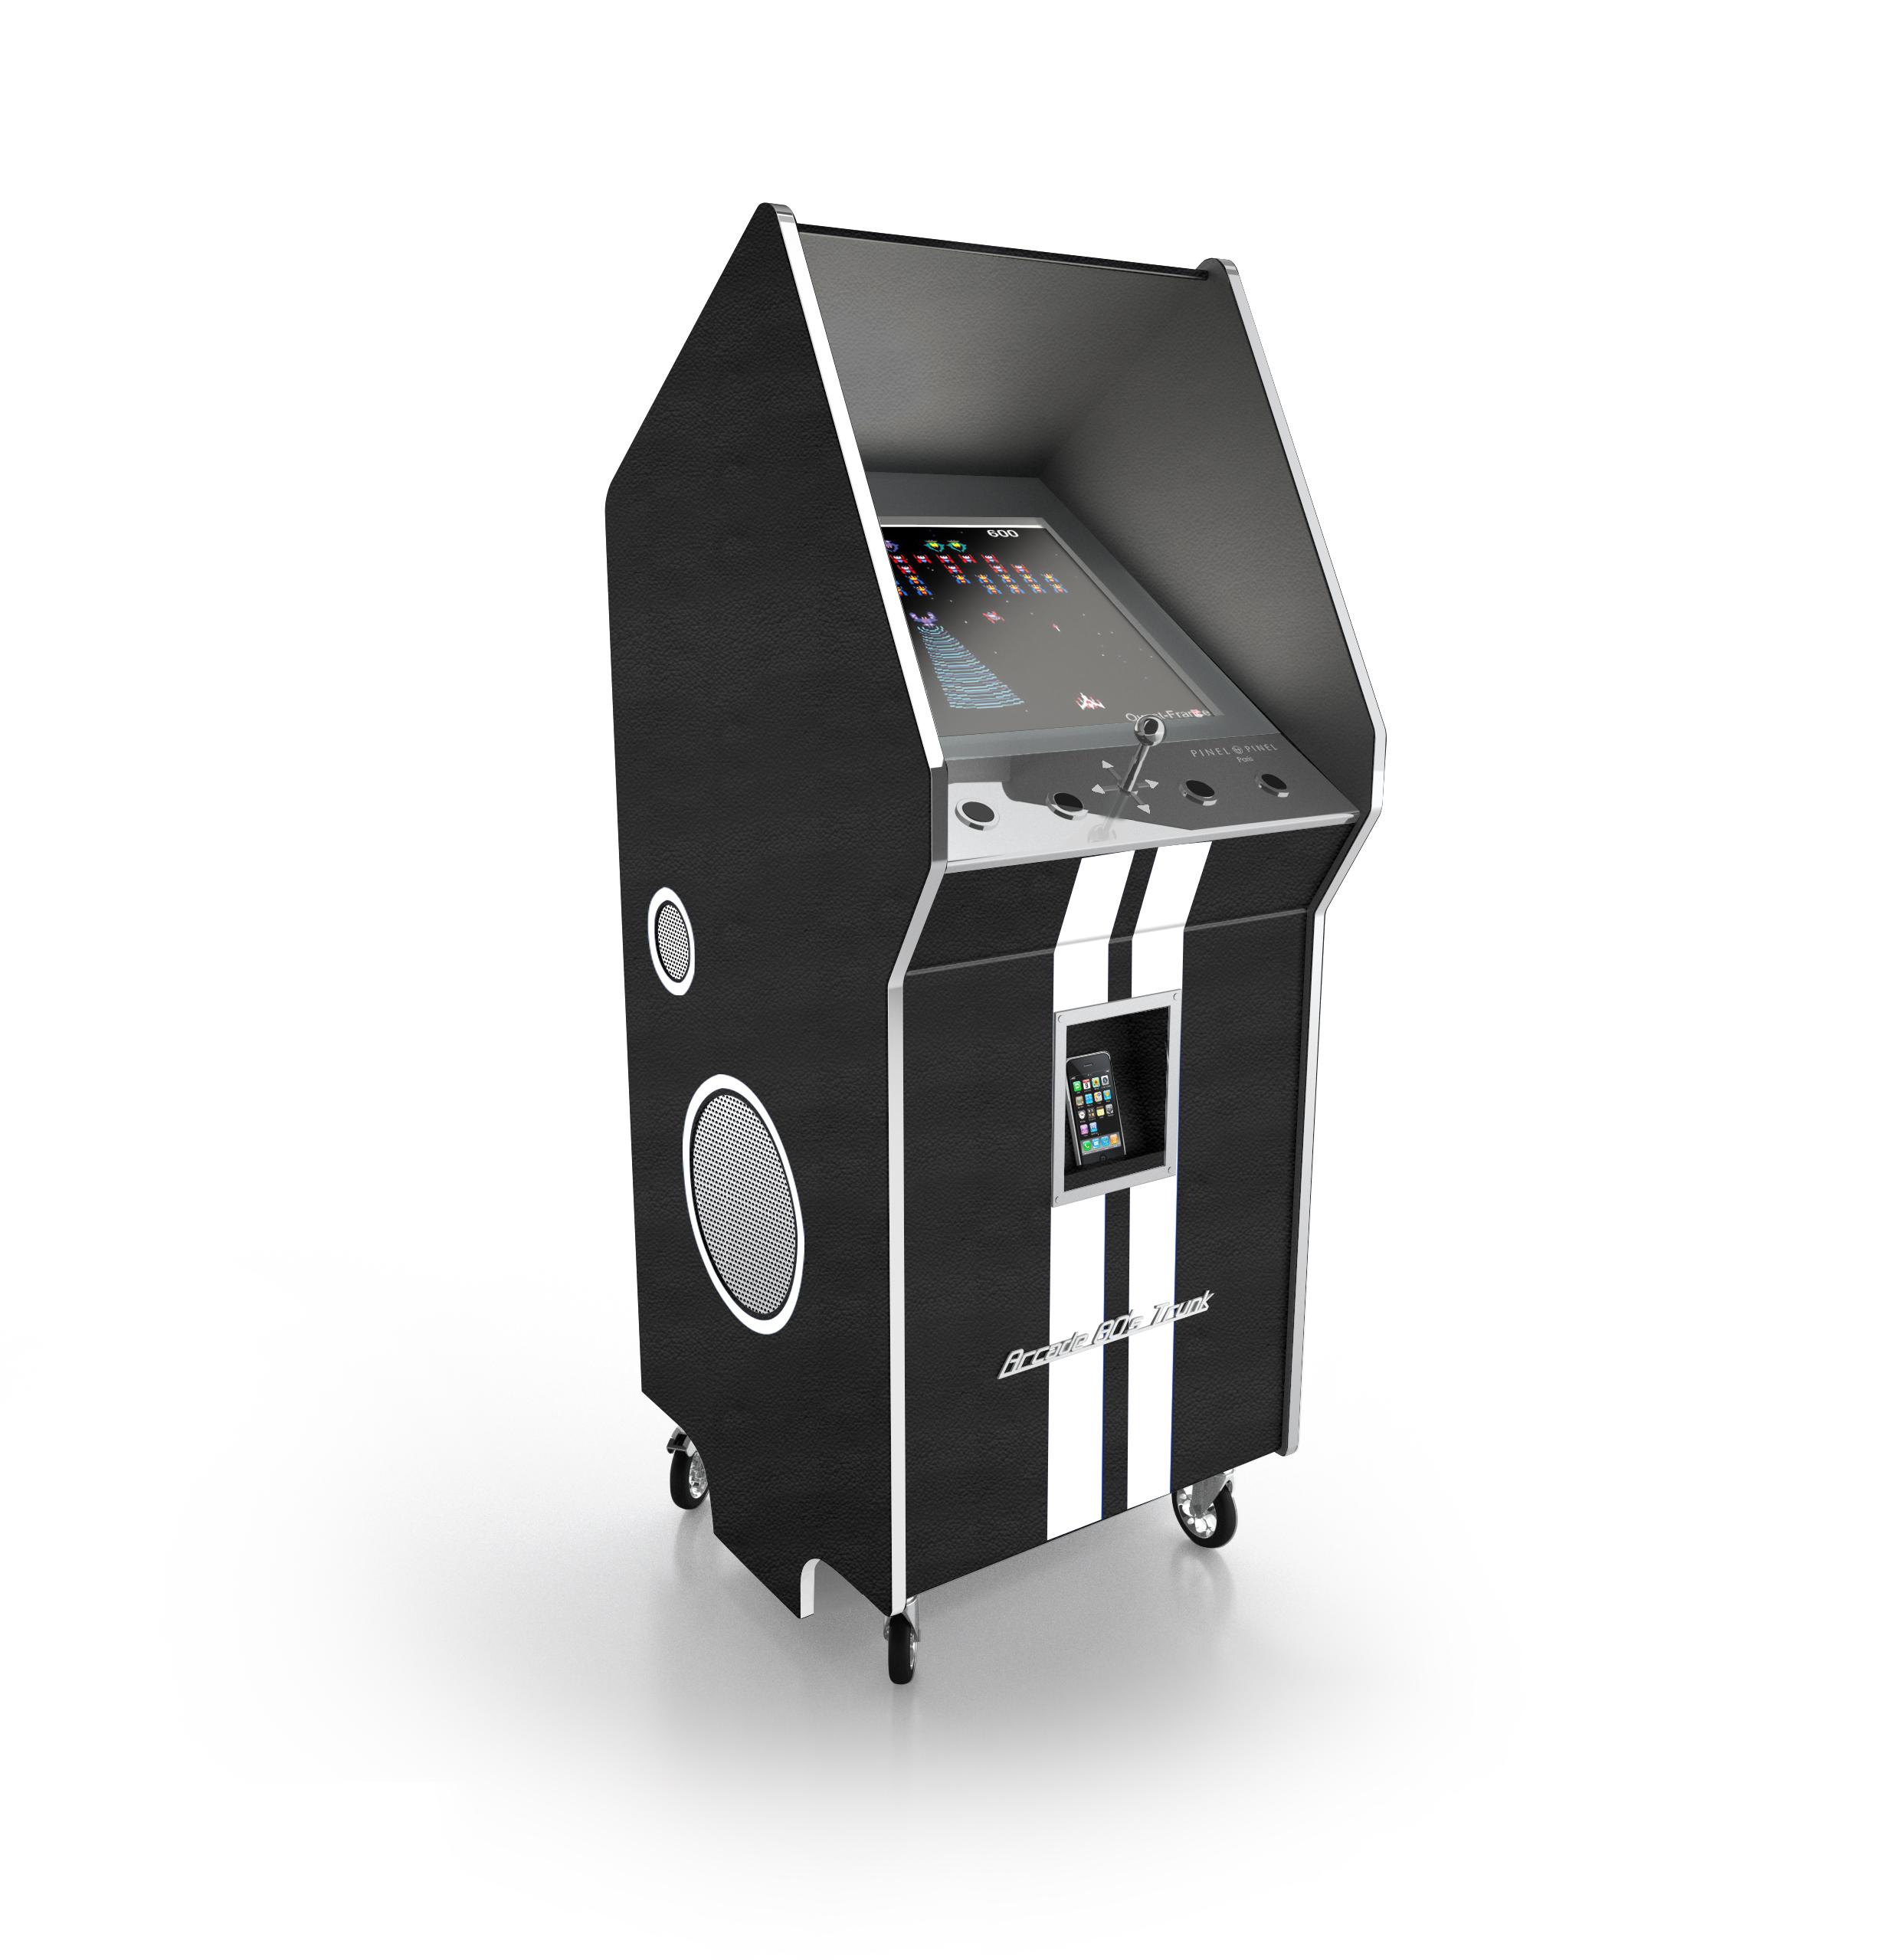 pinel-et-pinel_visuel_arcade-80-trunk_black